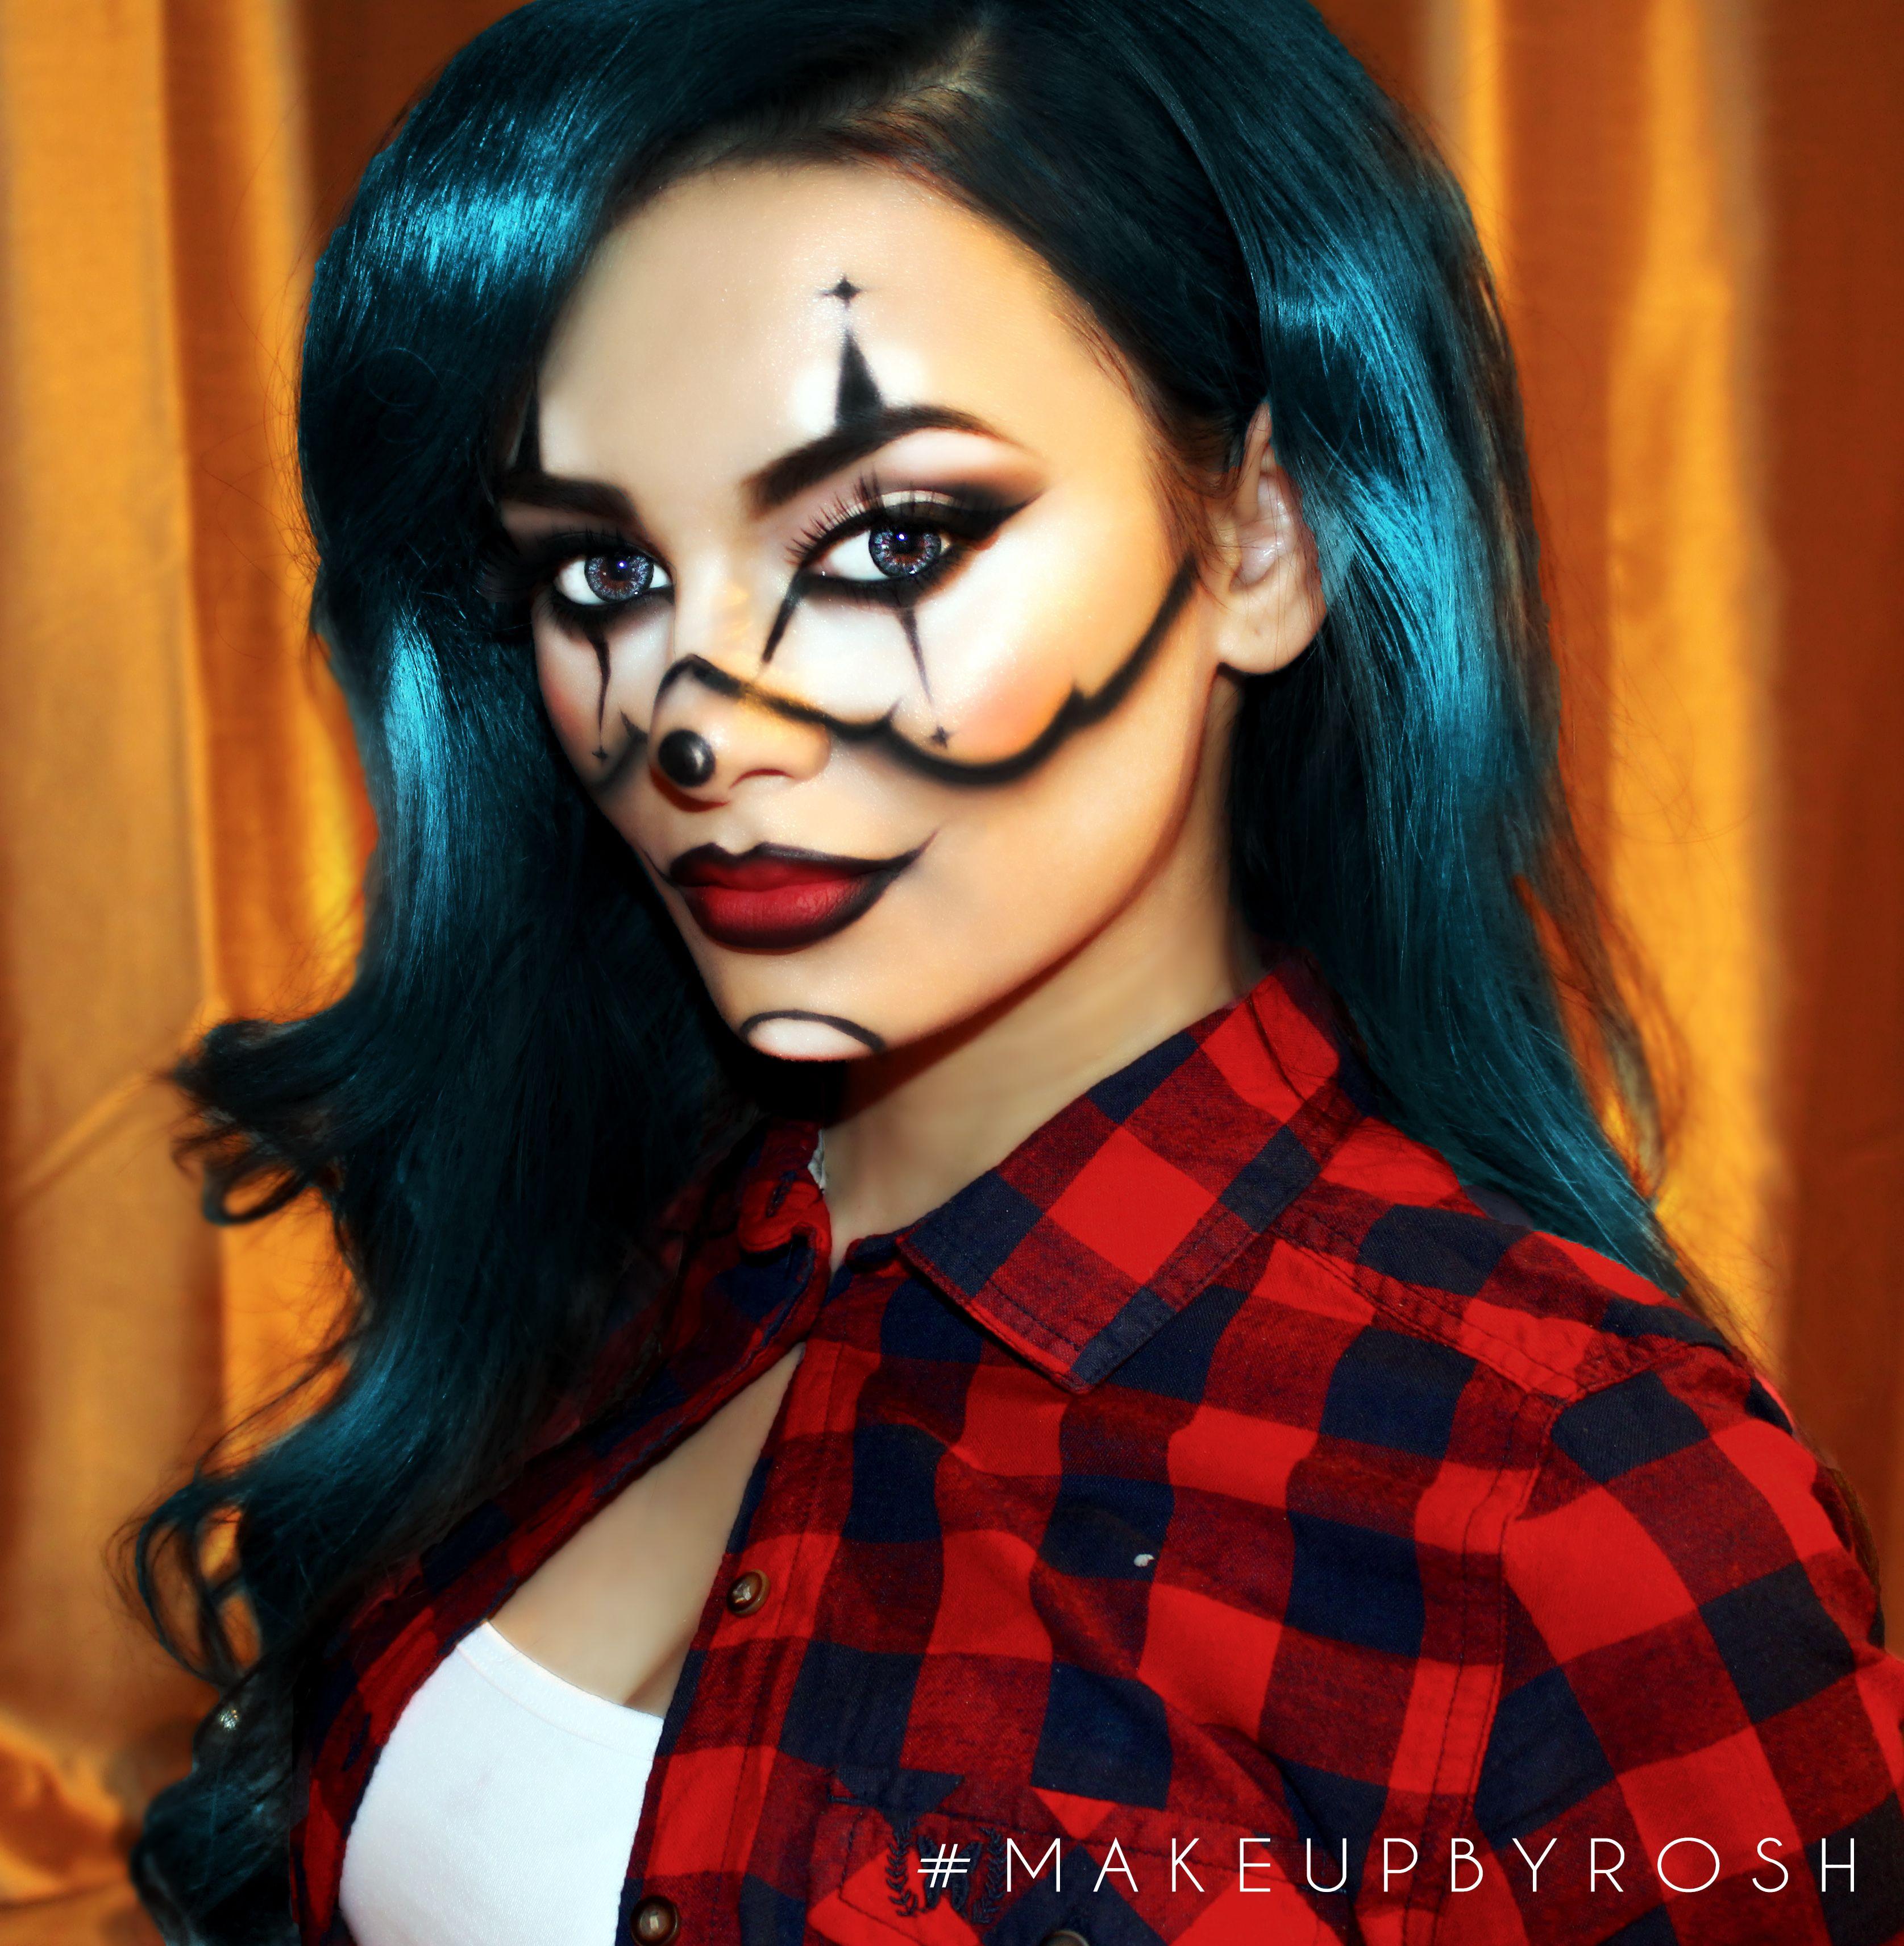 gangster halloween makeup   cartooncreative.co